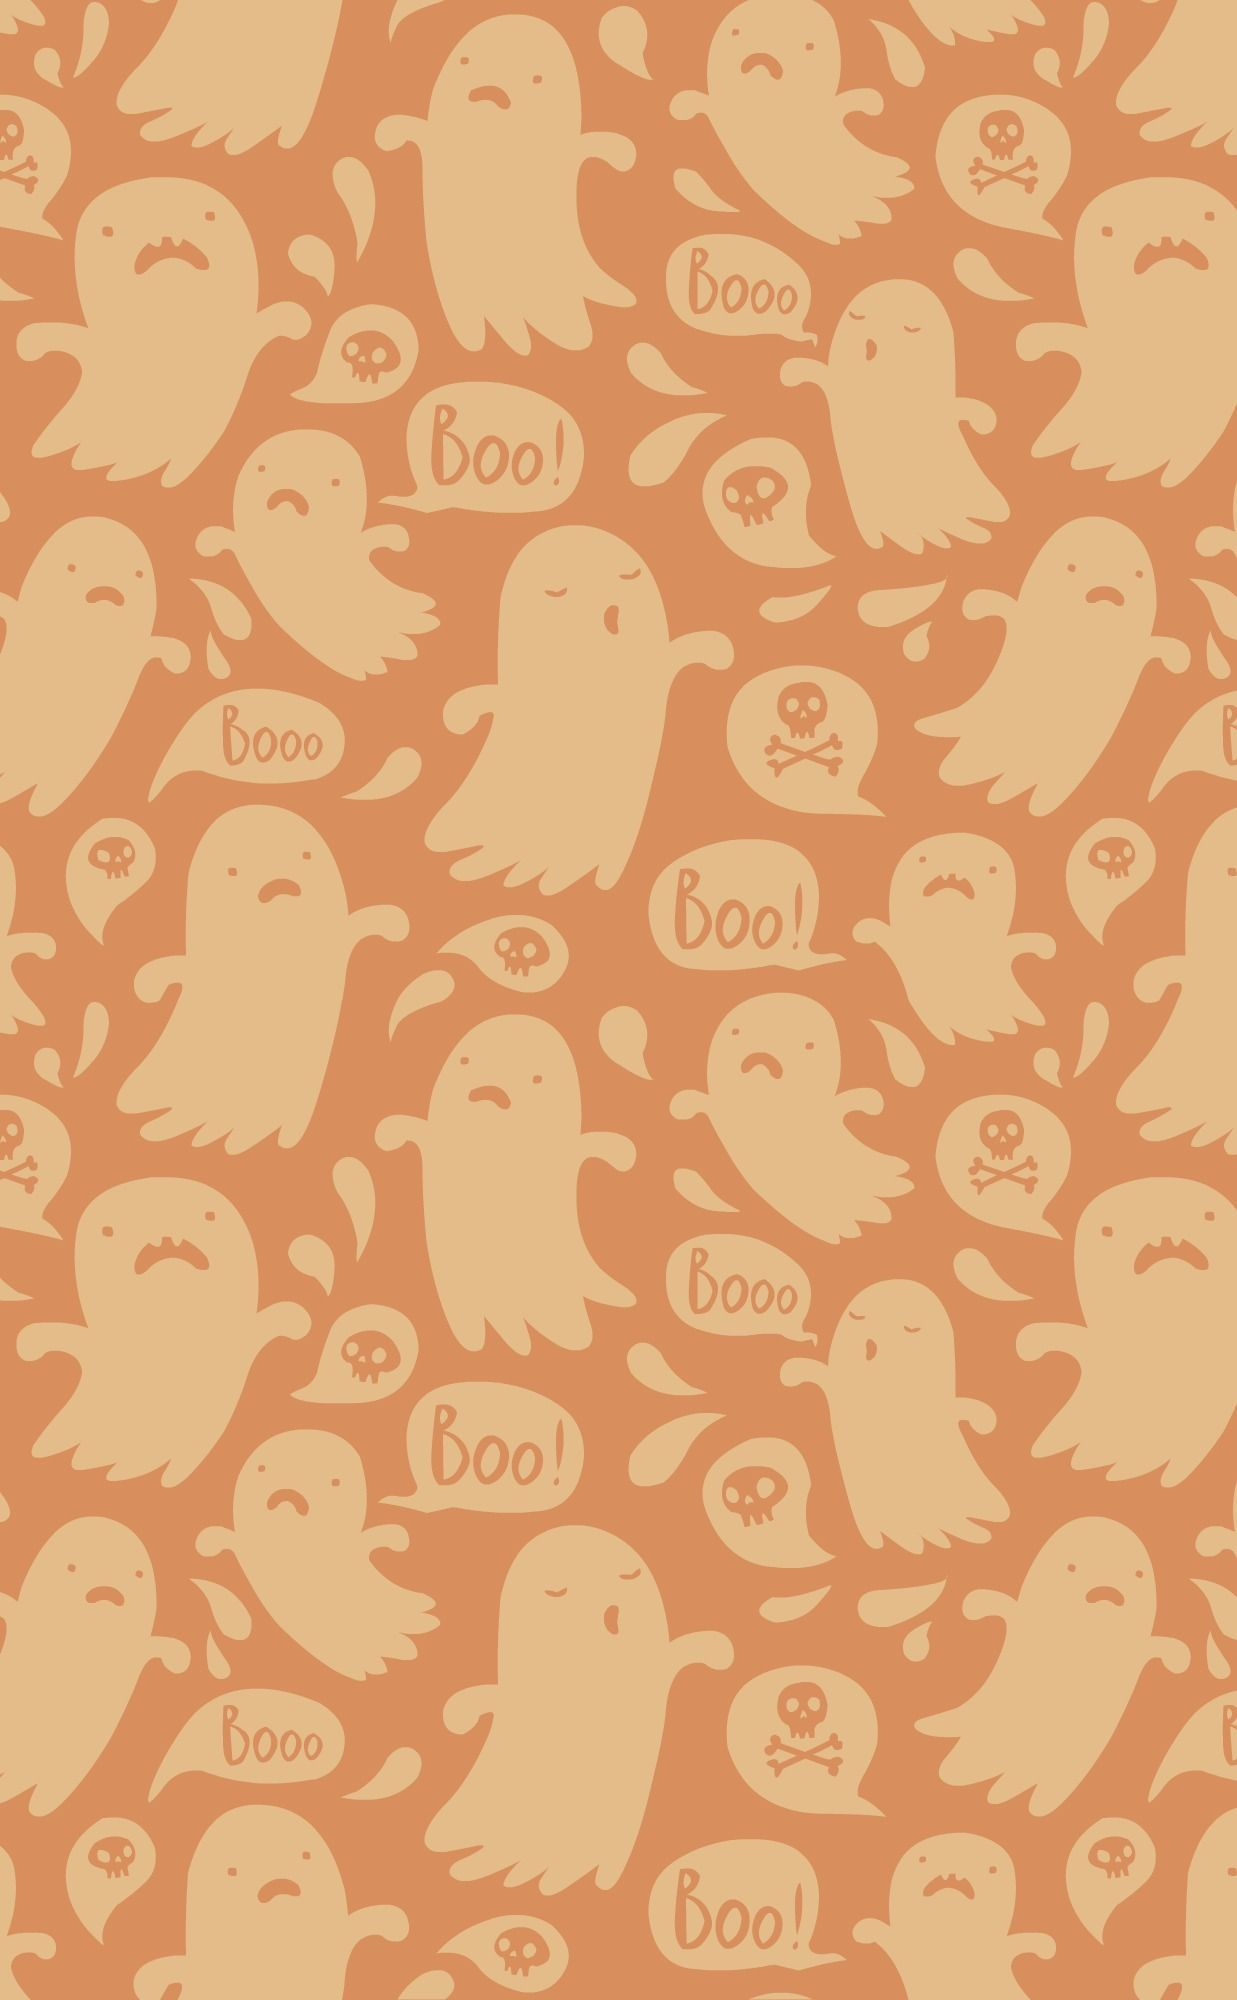 Tumblr Halloween Wallpapers Top Free Tumblr Halloween Backgrounds Wallpaperaccess